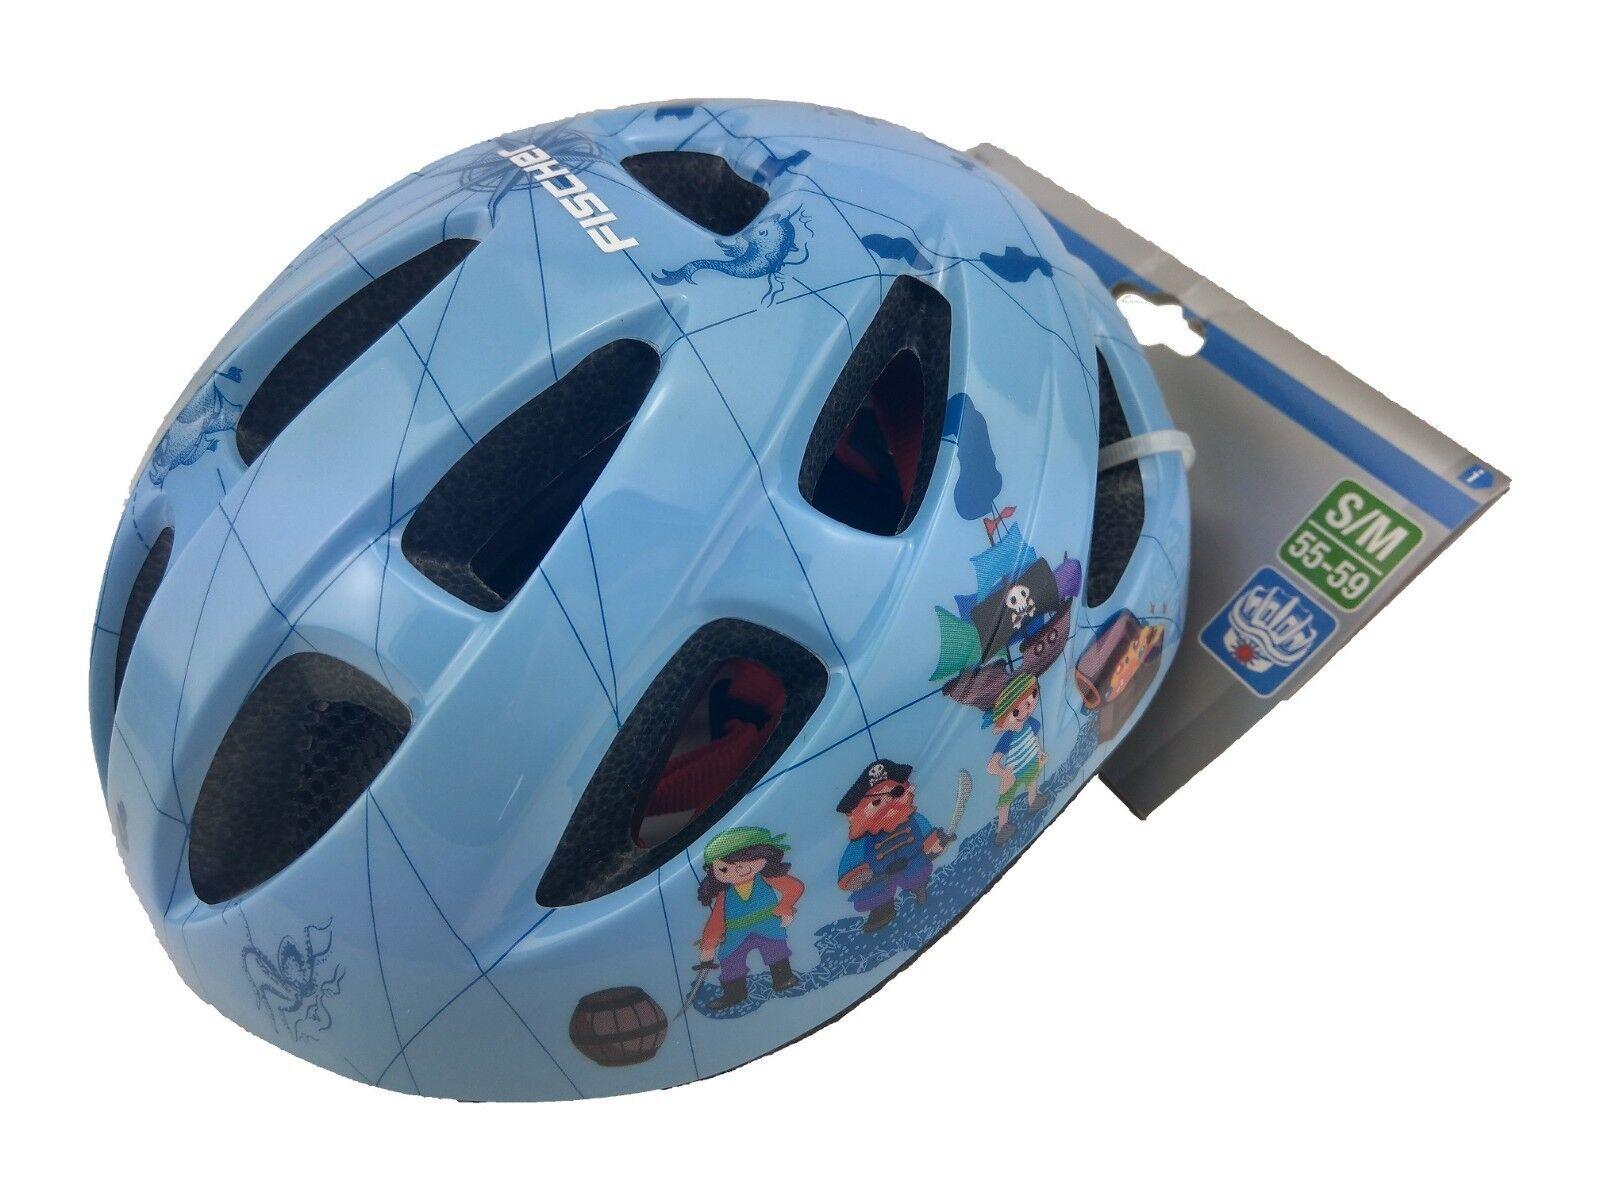 "Fischer Fischer Fischer casco de bicicleta infantil ""piratas"" S M Seguridad caída casco Kids con luz  Ven a elegir tu propio estilo deportivo."